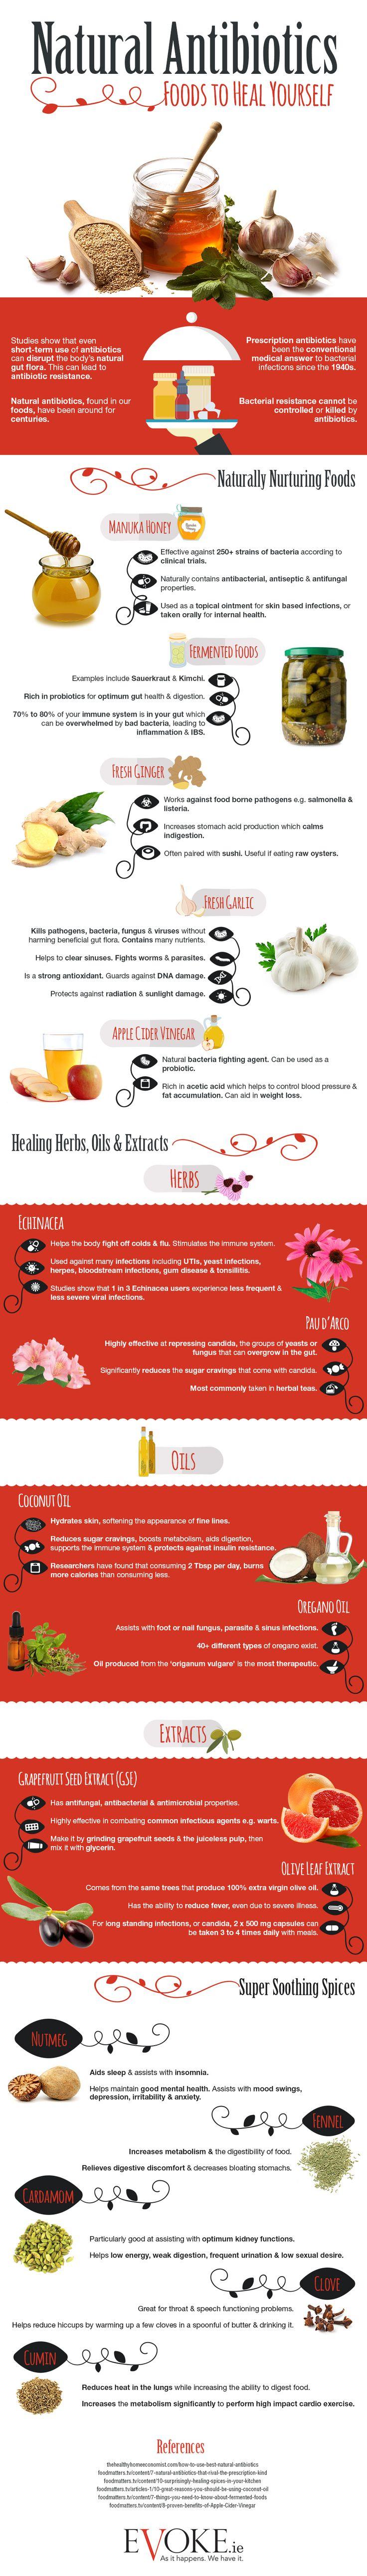 (Infographic) Natural Antibiotics, Foods to Heal Yourself